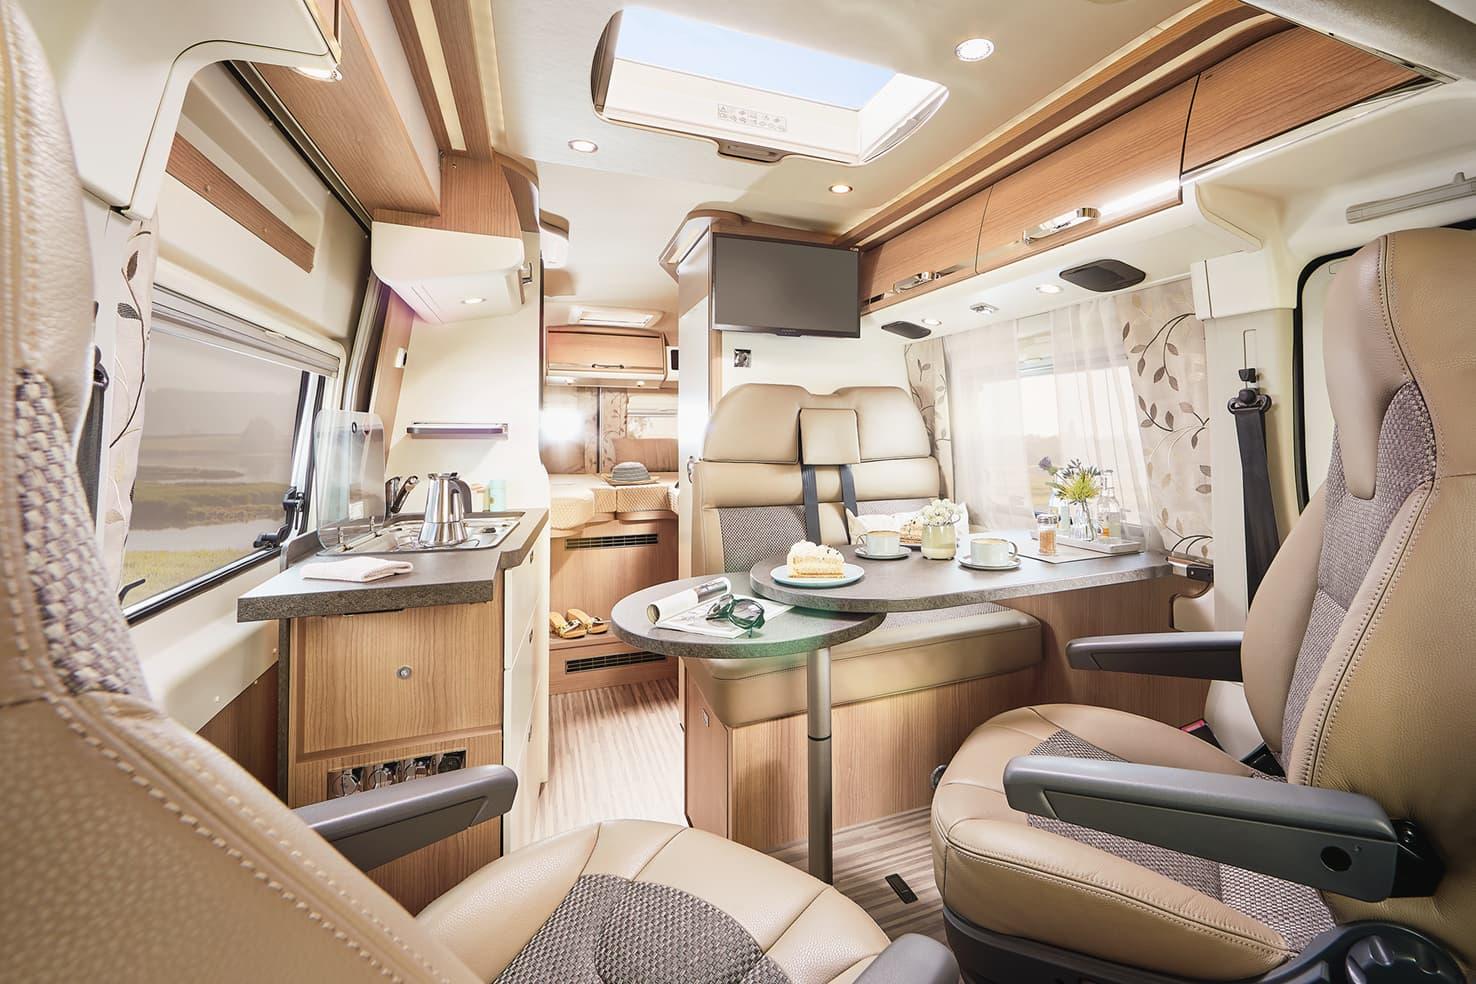 Hirschbühl Caravan Rental Malibu Van 640 GT Charming LE innen am Tag